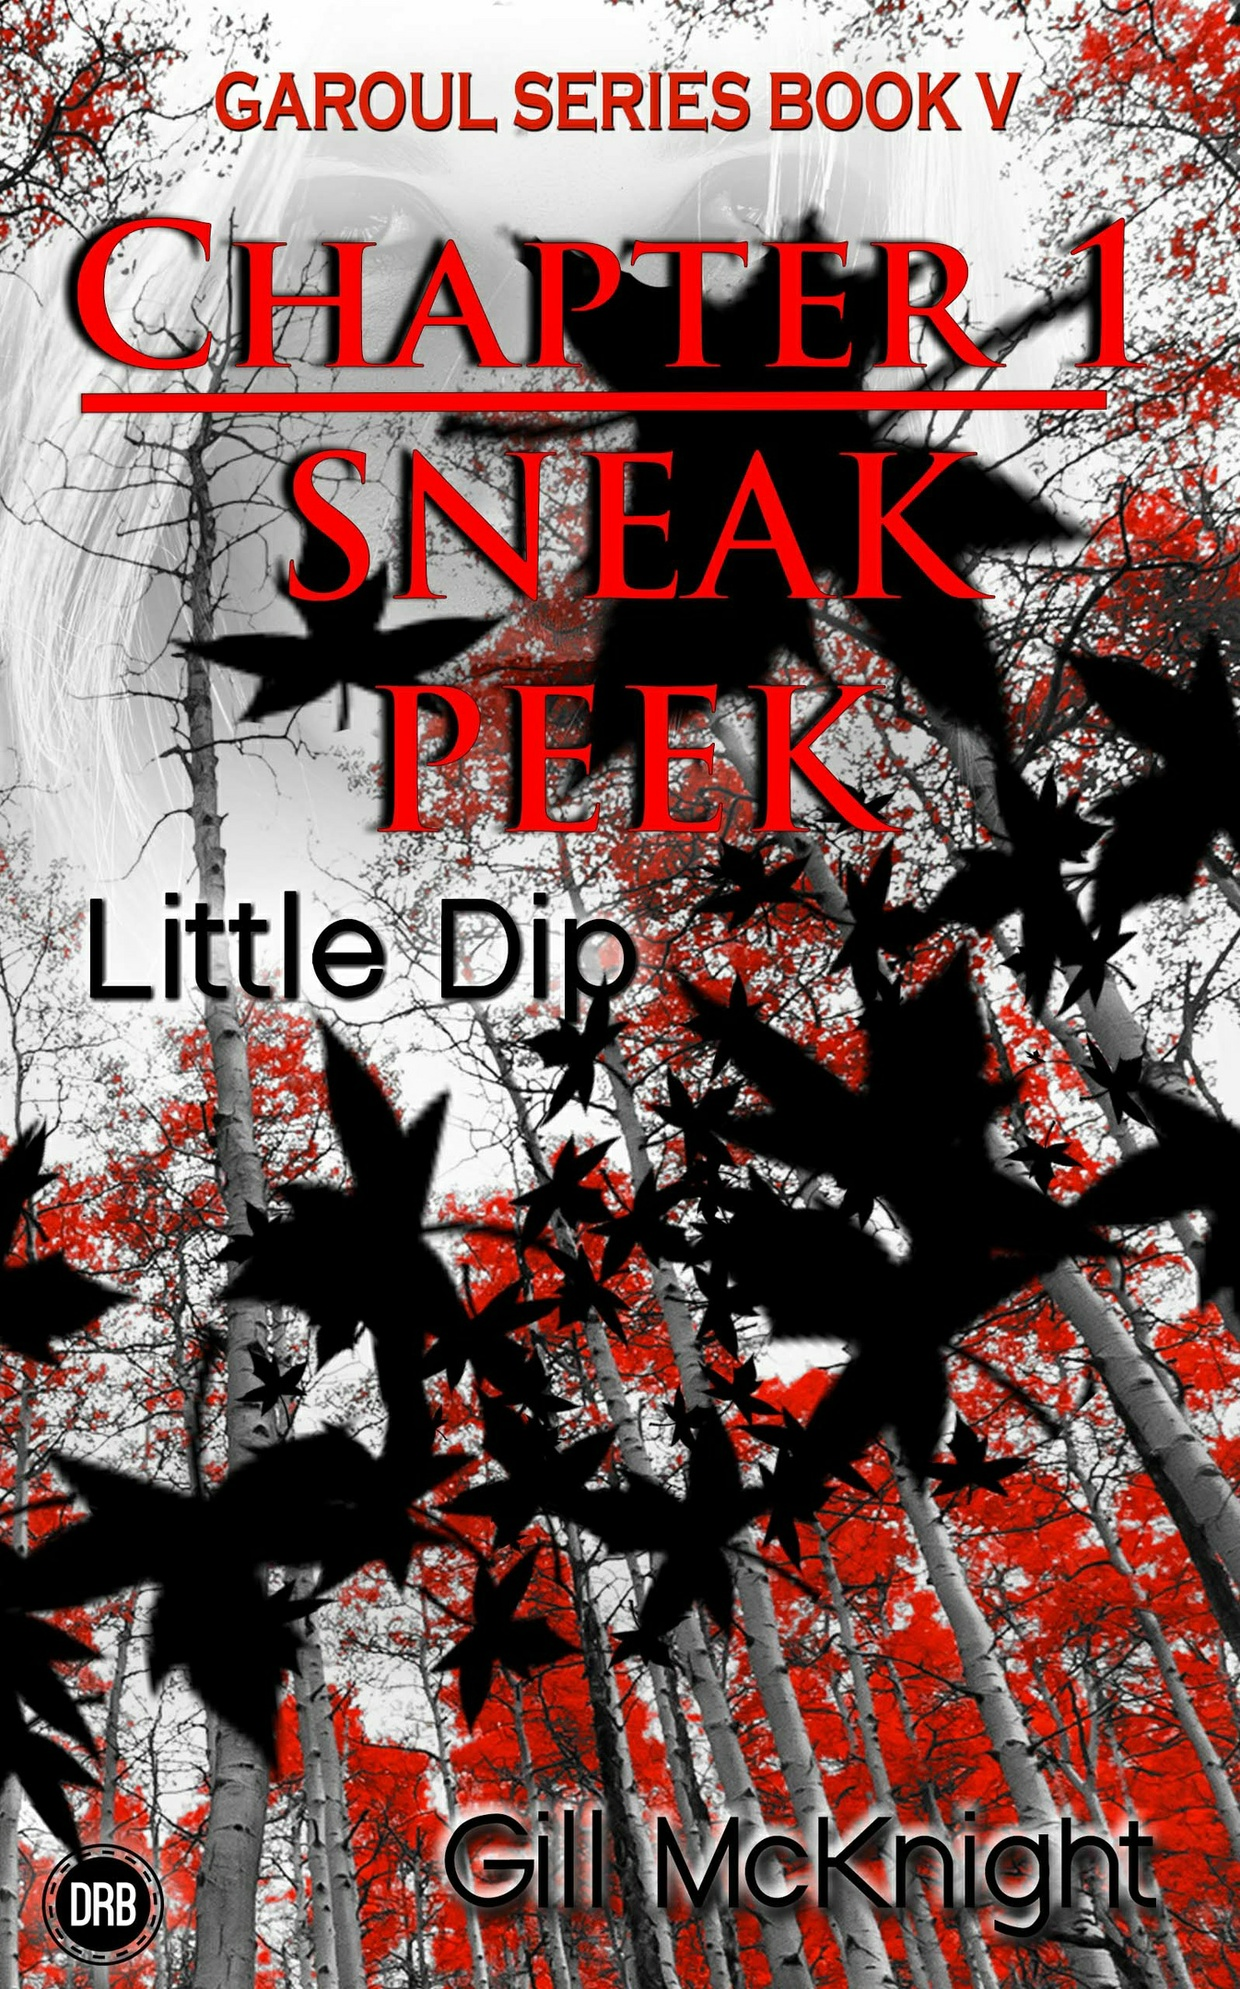 Little Dip by Gill McKnight - Chapter 1 sneak peek (mobi)